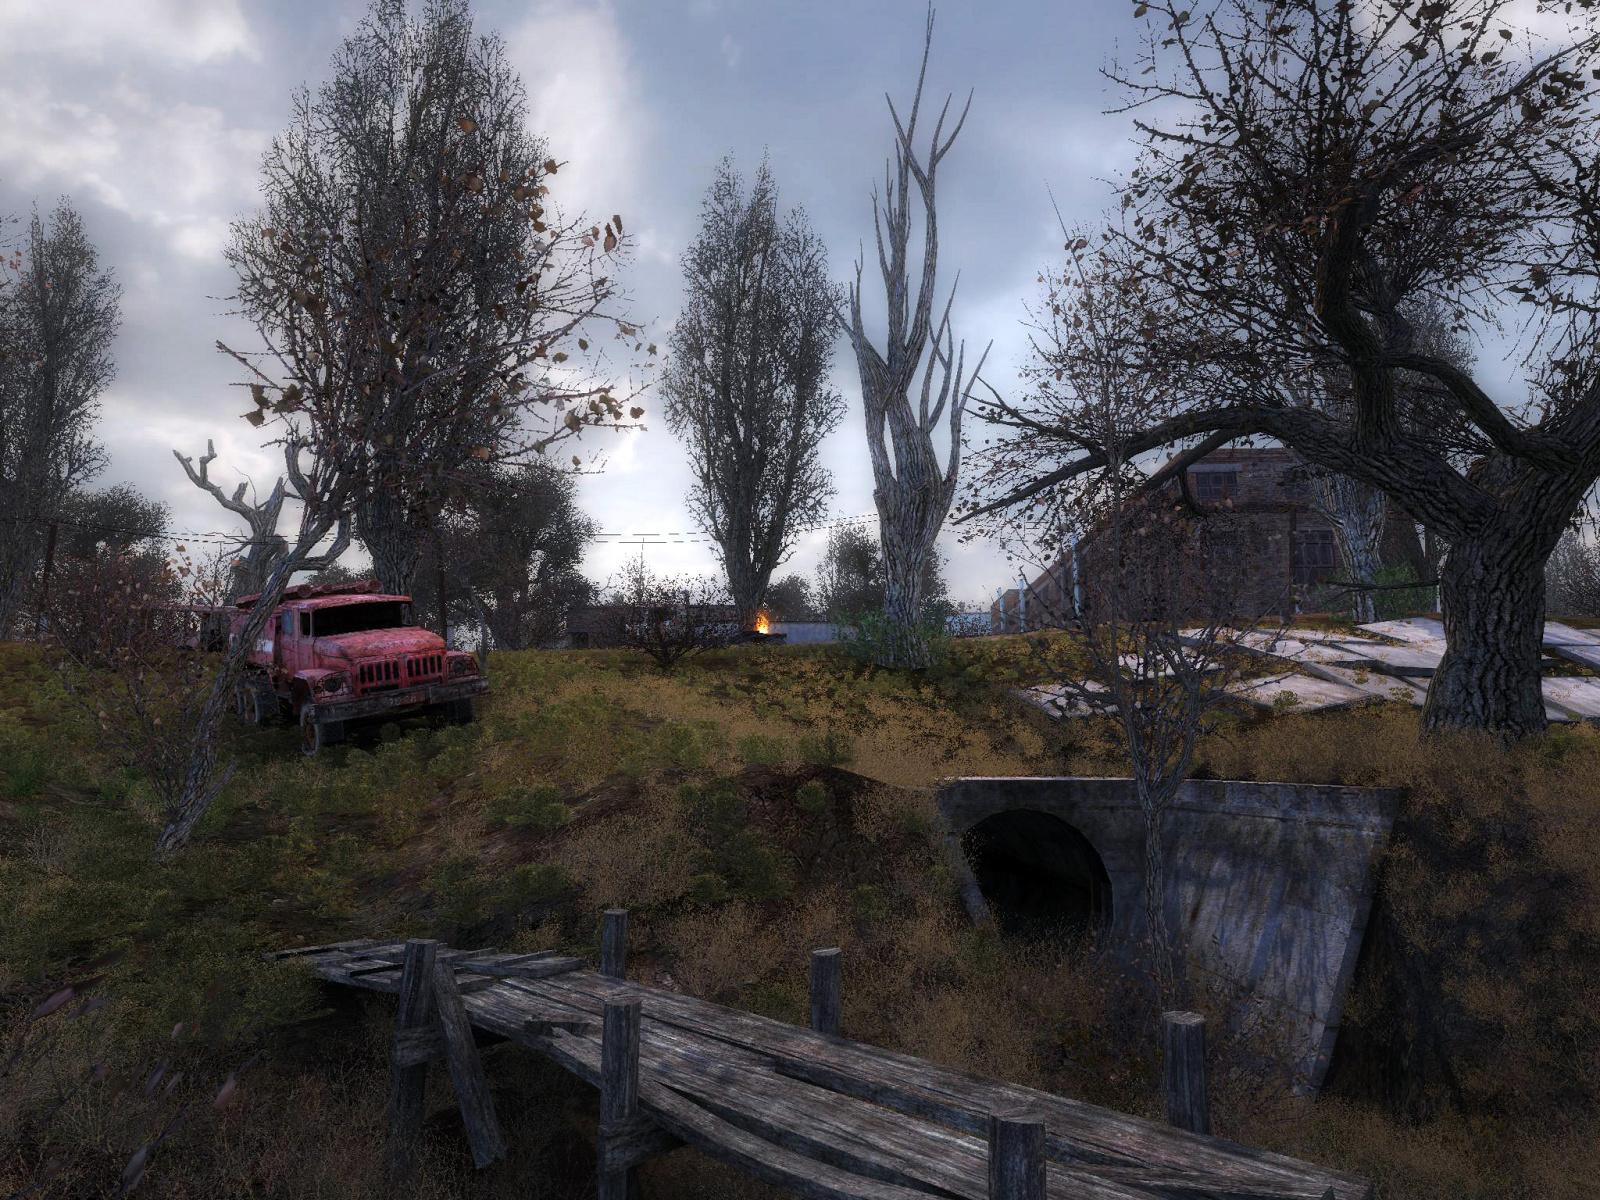 S.T.A.L.K.E.R. Shadow of Chernobyl пейзаж с элементами отечестве…